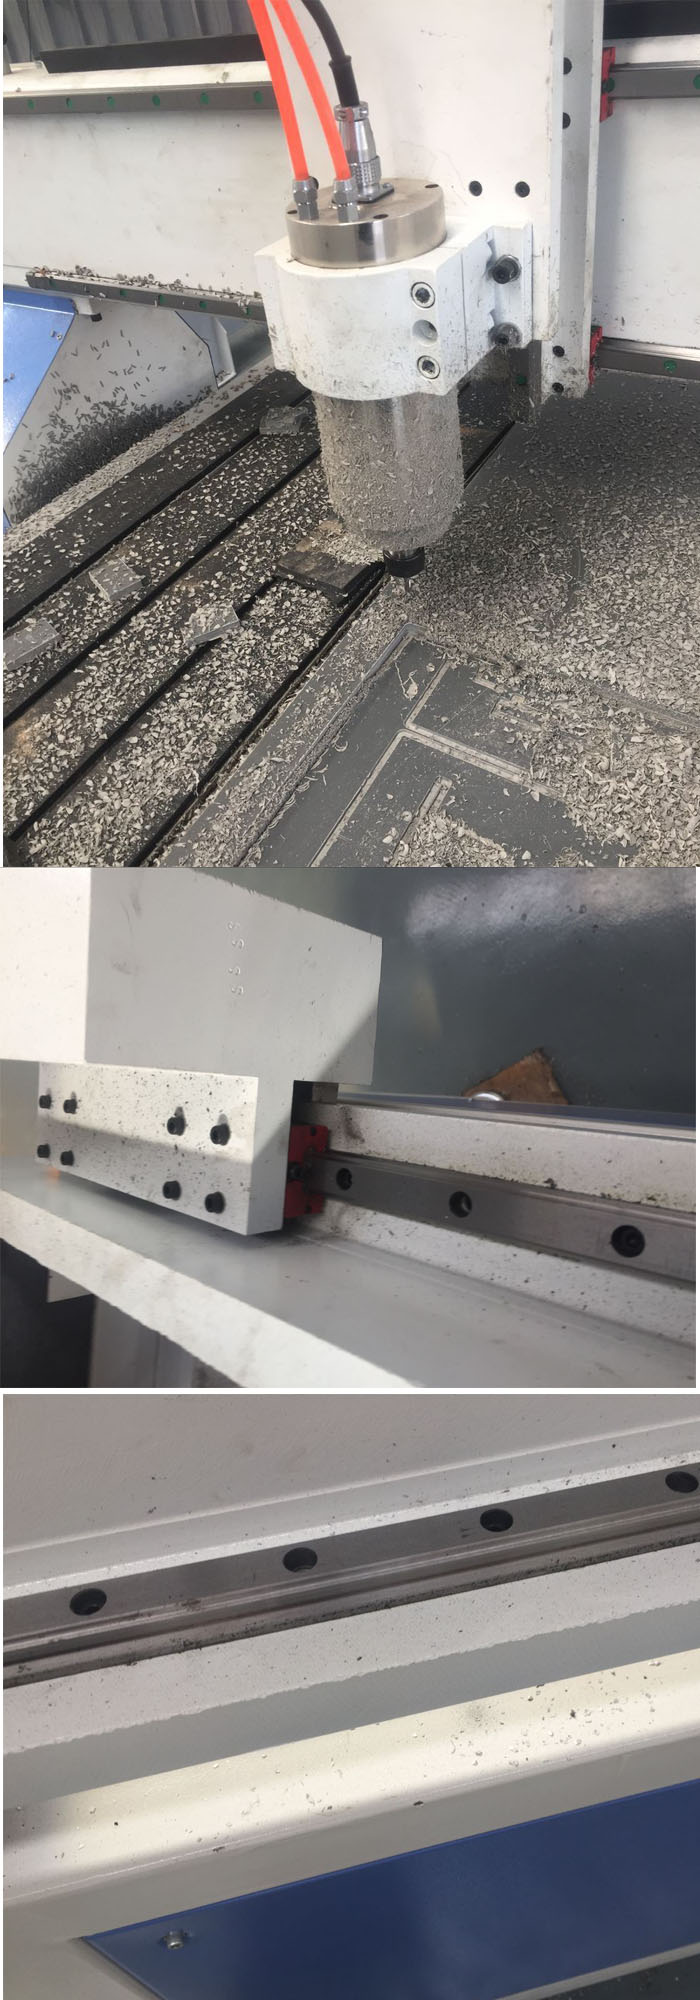 Ck1325 3D Embossment Wood Acrylic Brass Alumnium CNC Router Machine